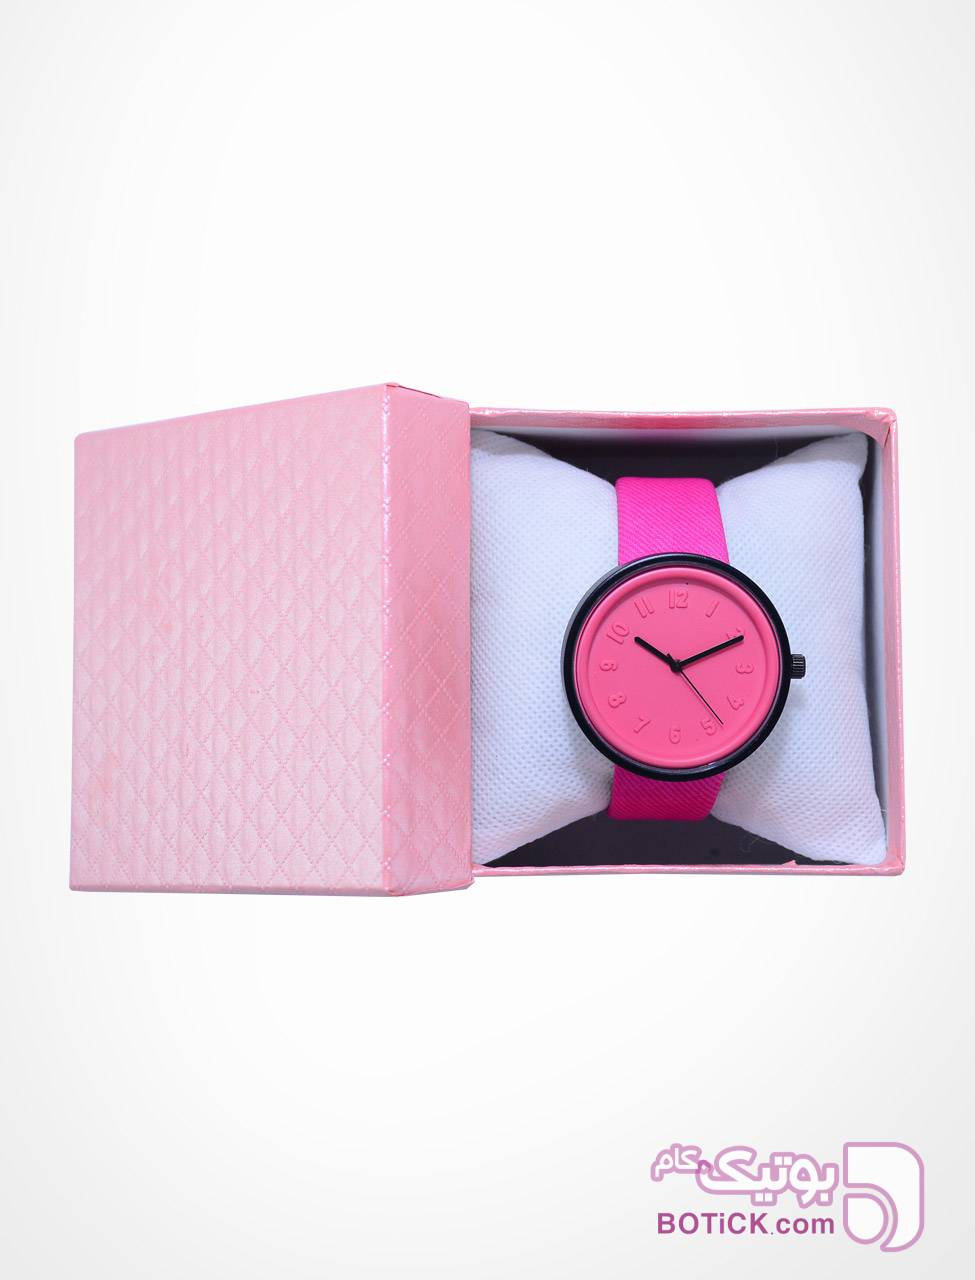 ساعت مچی اسپرت مولر زرد ساعت